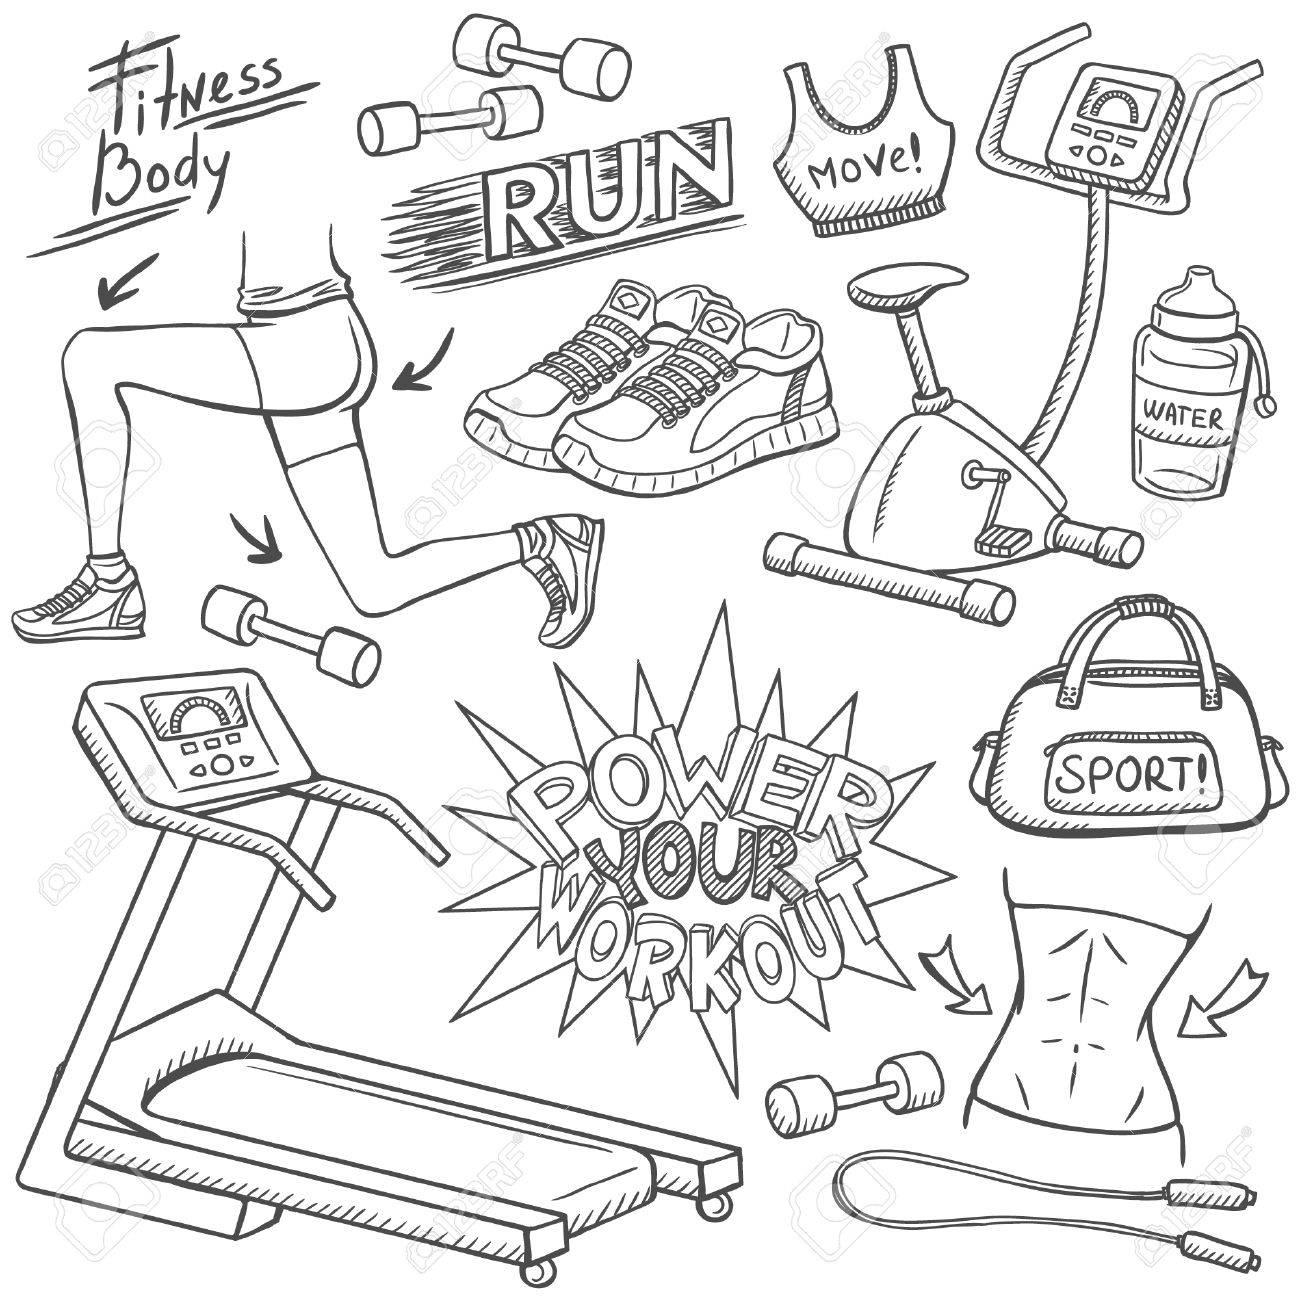 Gym doodles set - 30447826